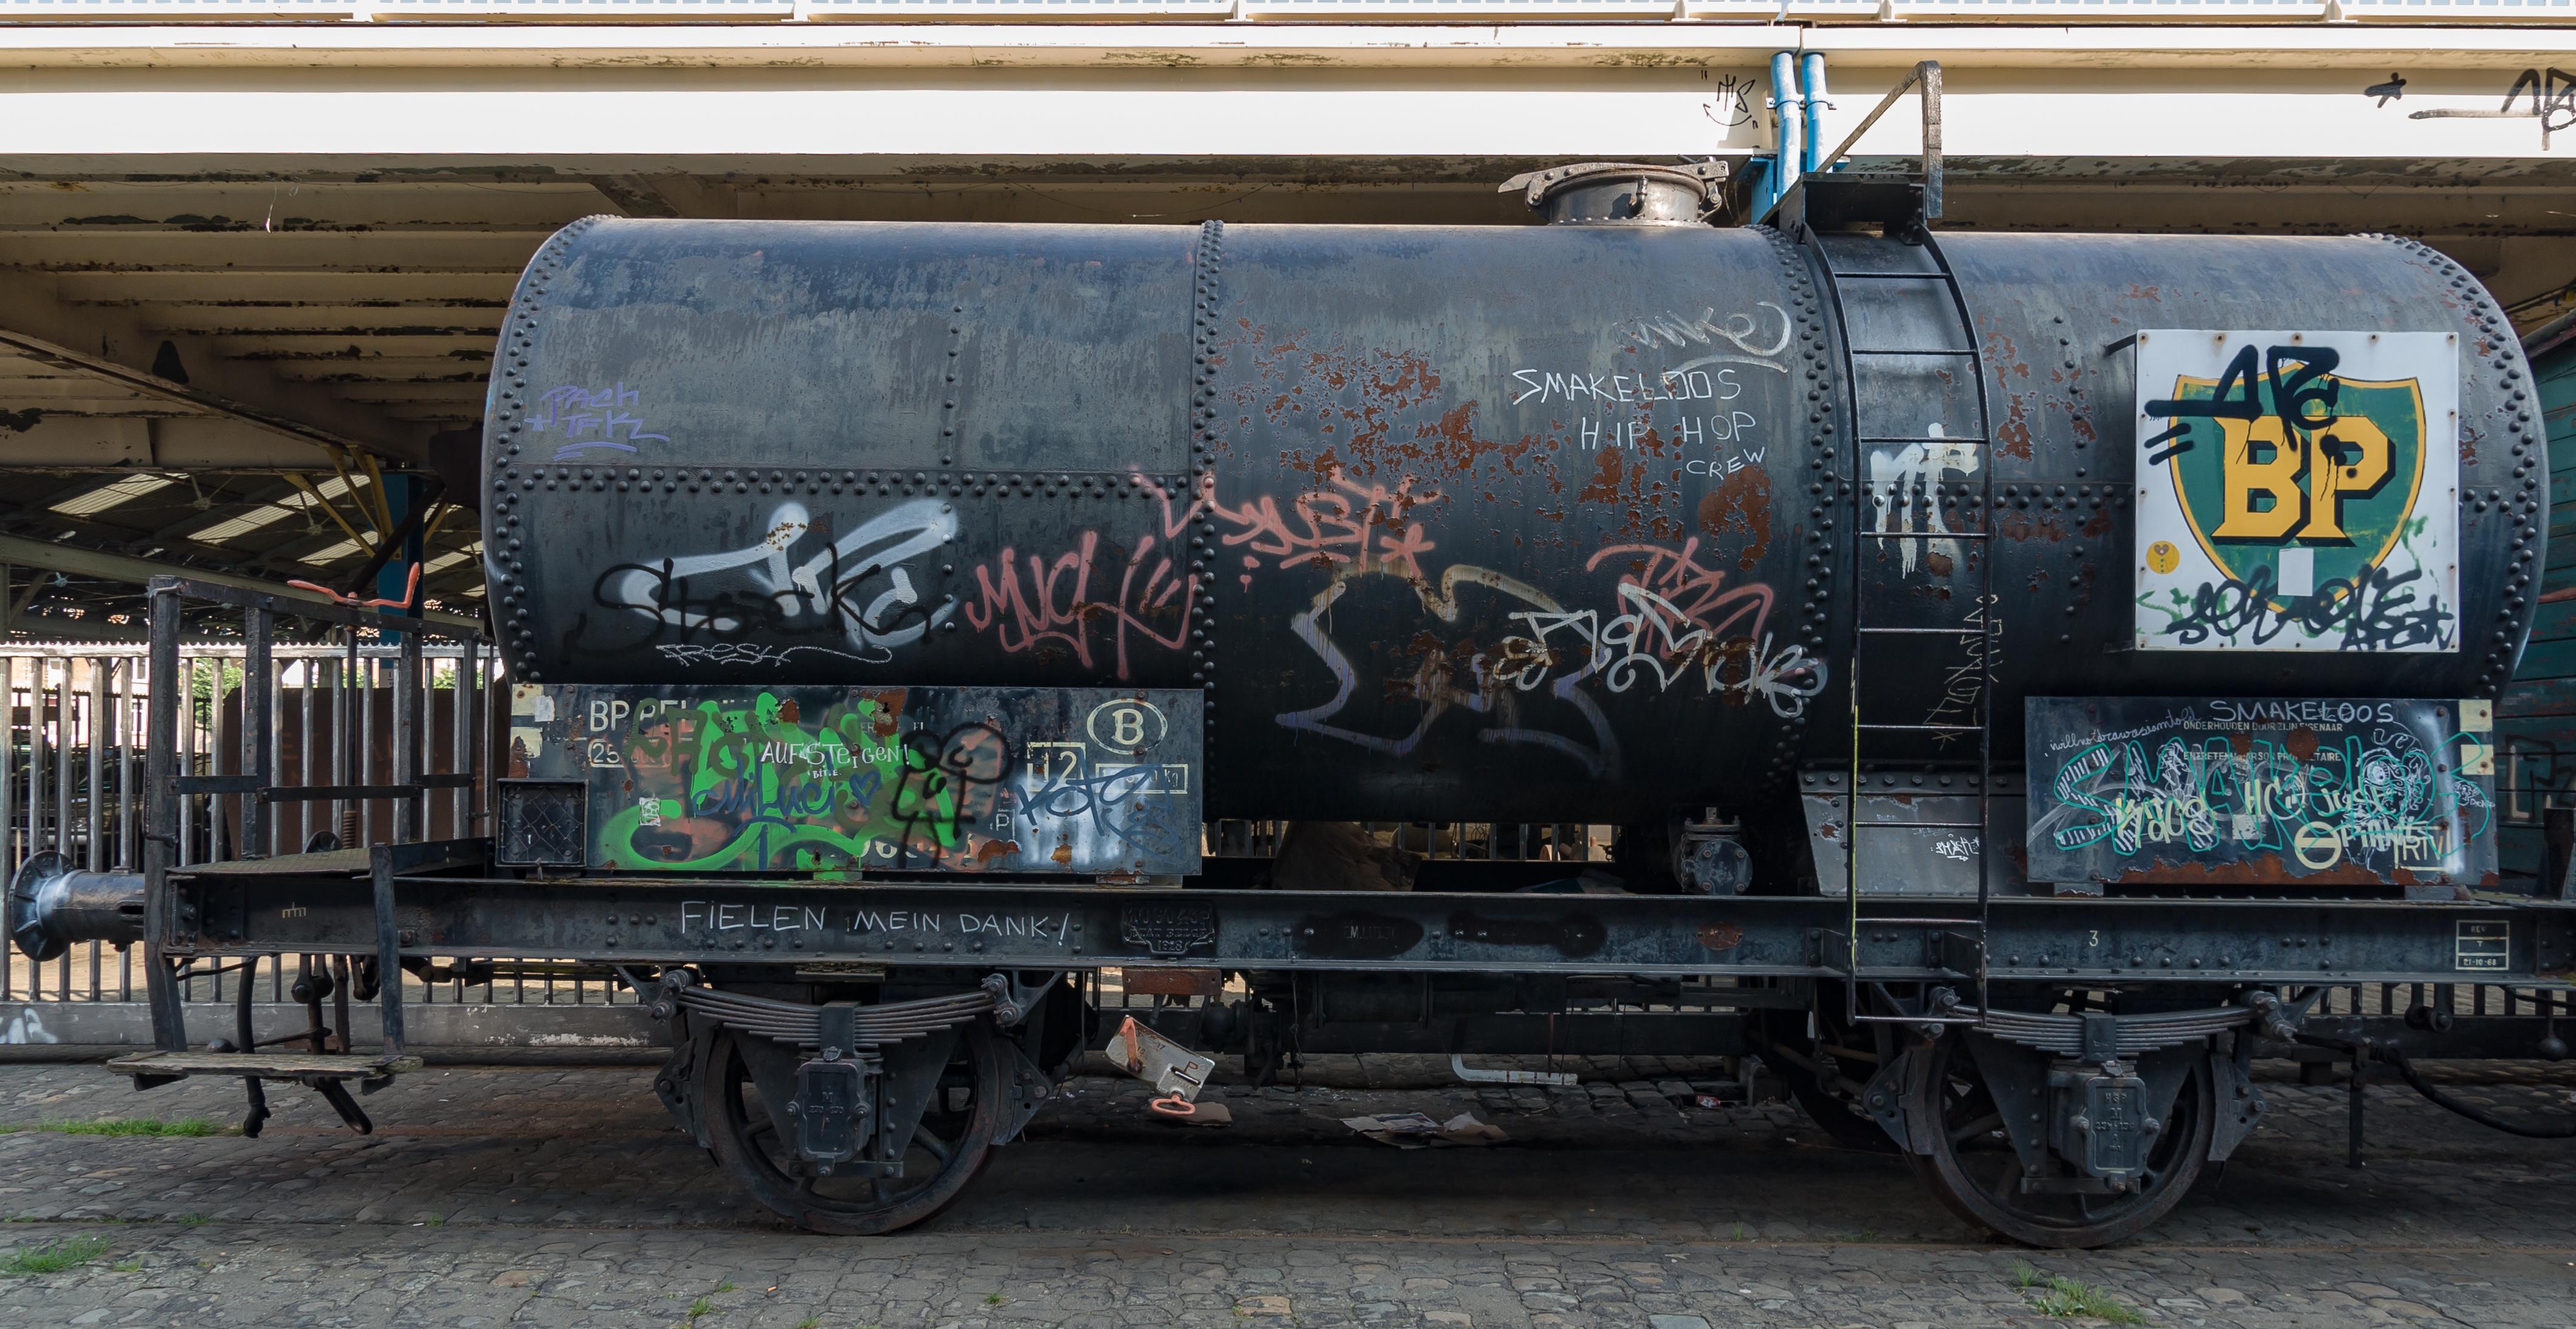 File Antwerp Belgium Bp Rail Tank Car 01 Jpg Wikimedia Commons